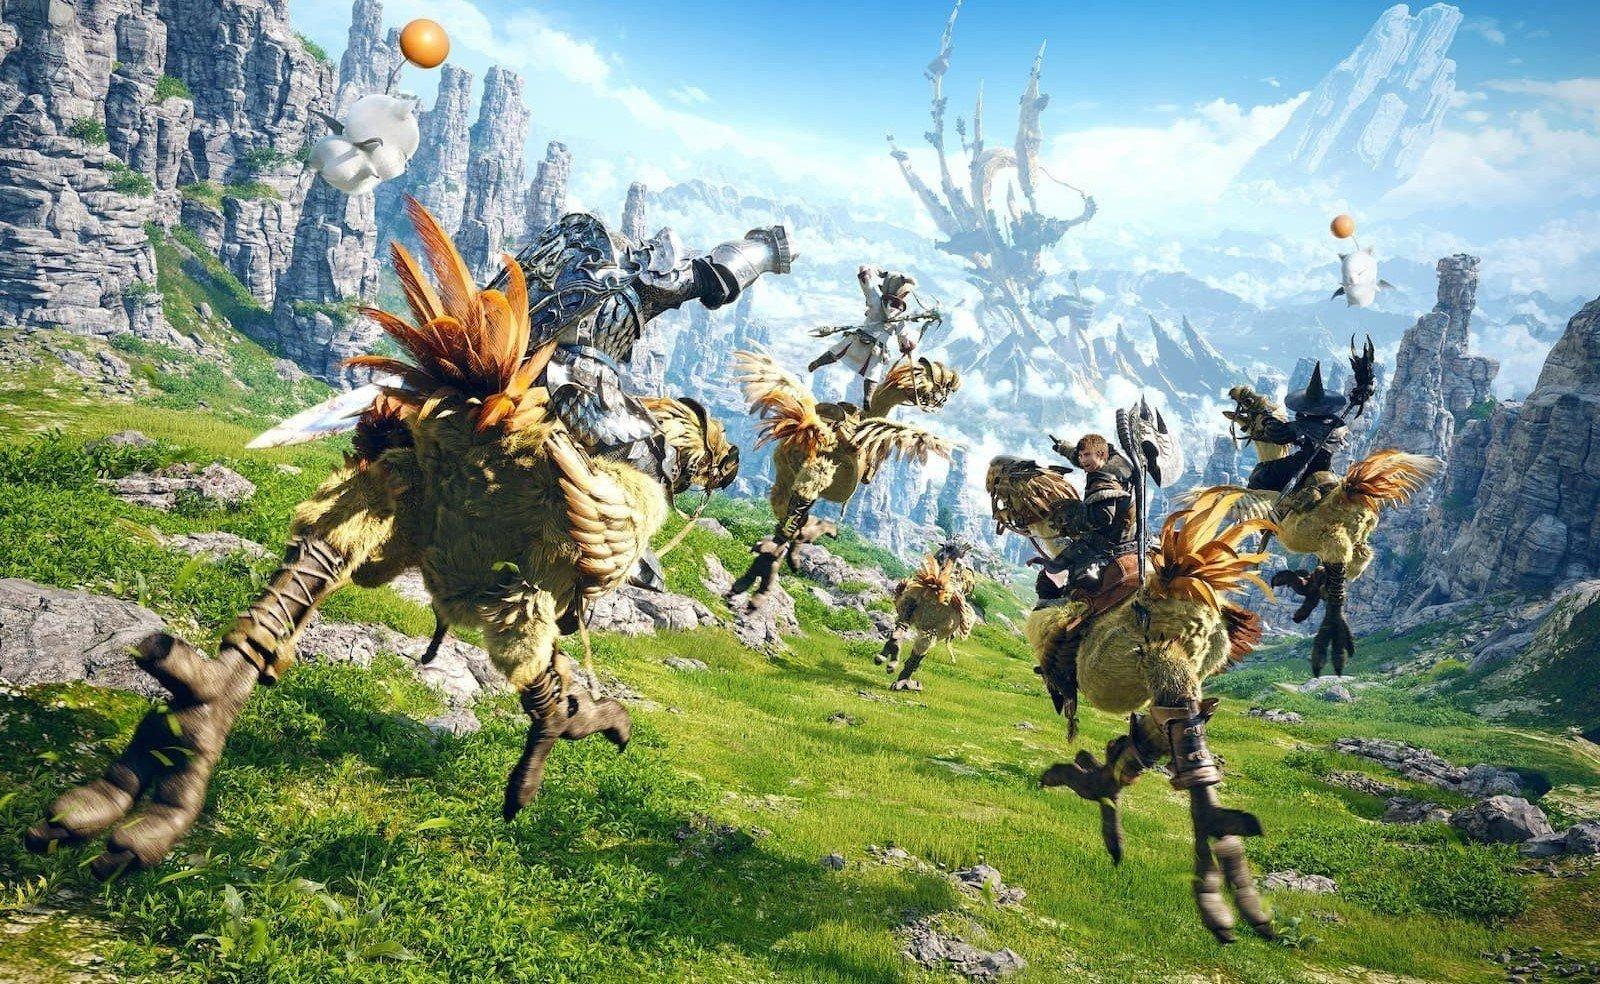 Final Fantasy XIV Confirmed for PS5 Backward Compatibility 1